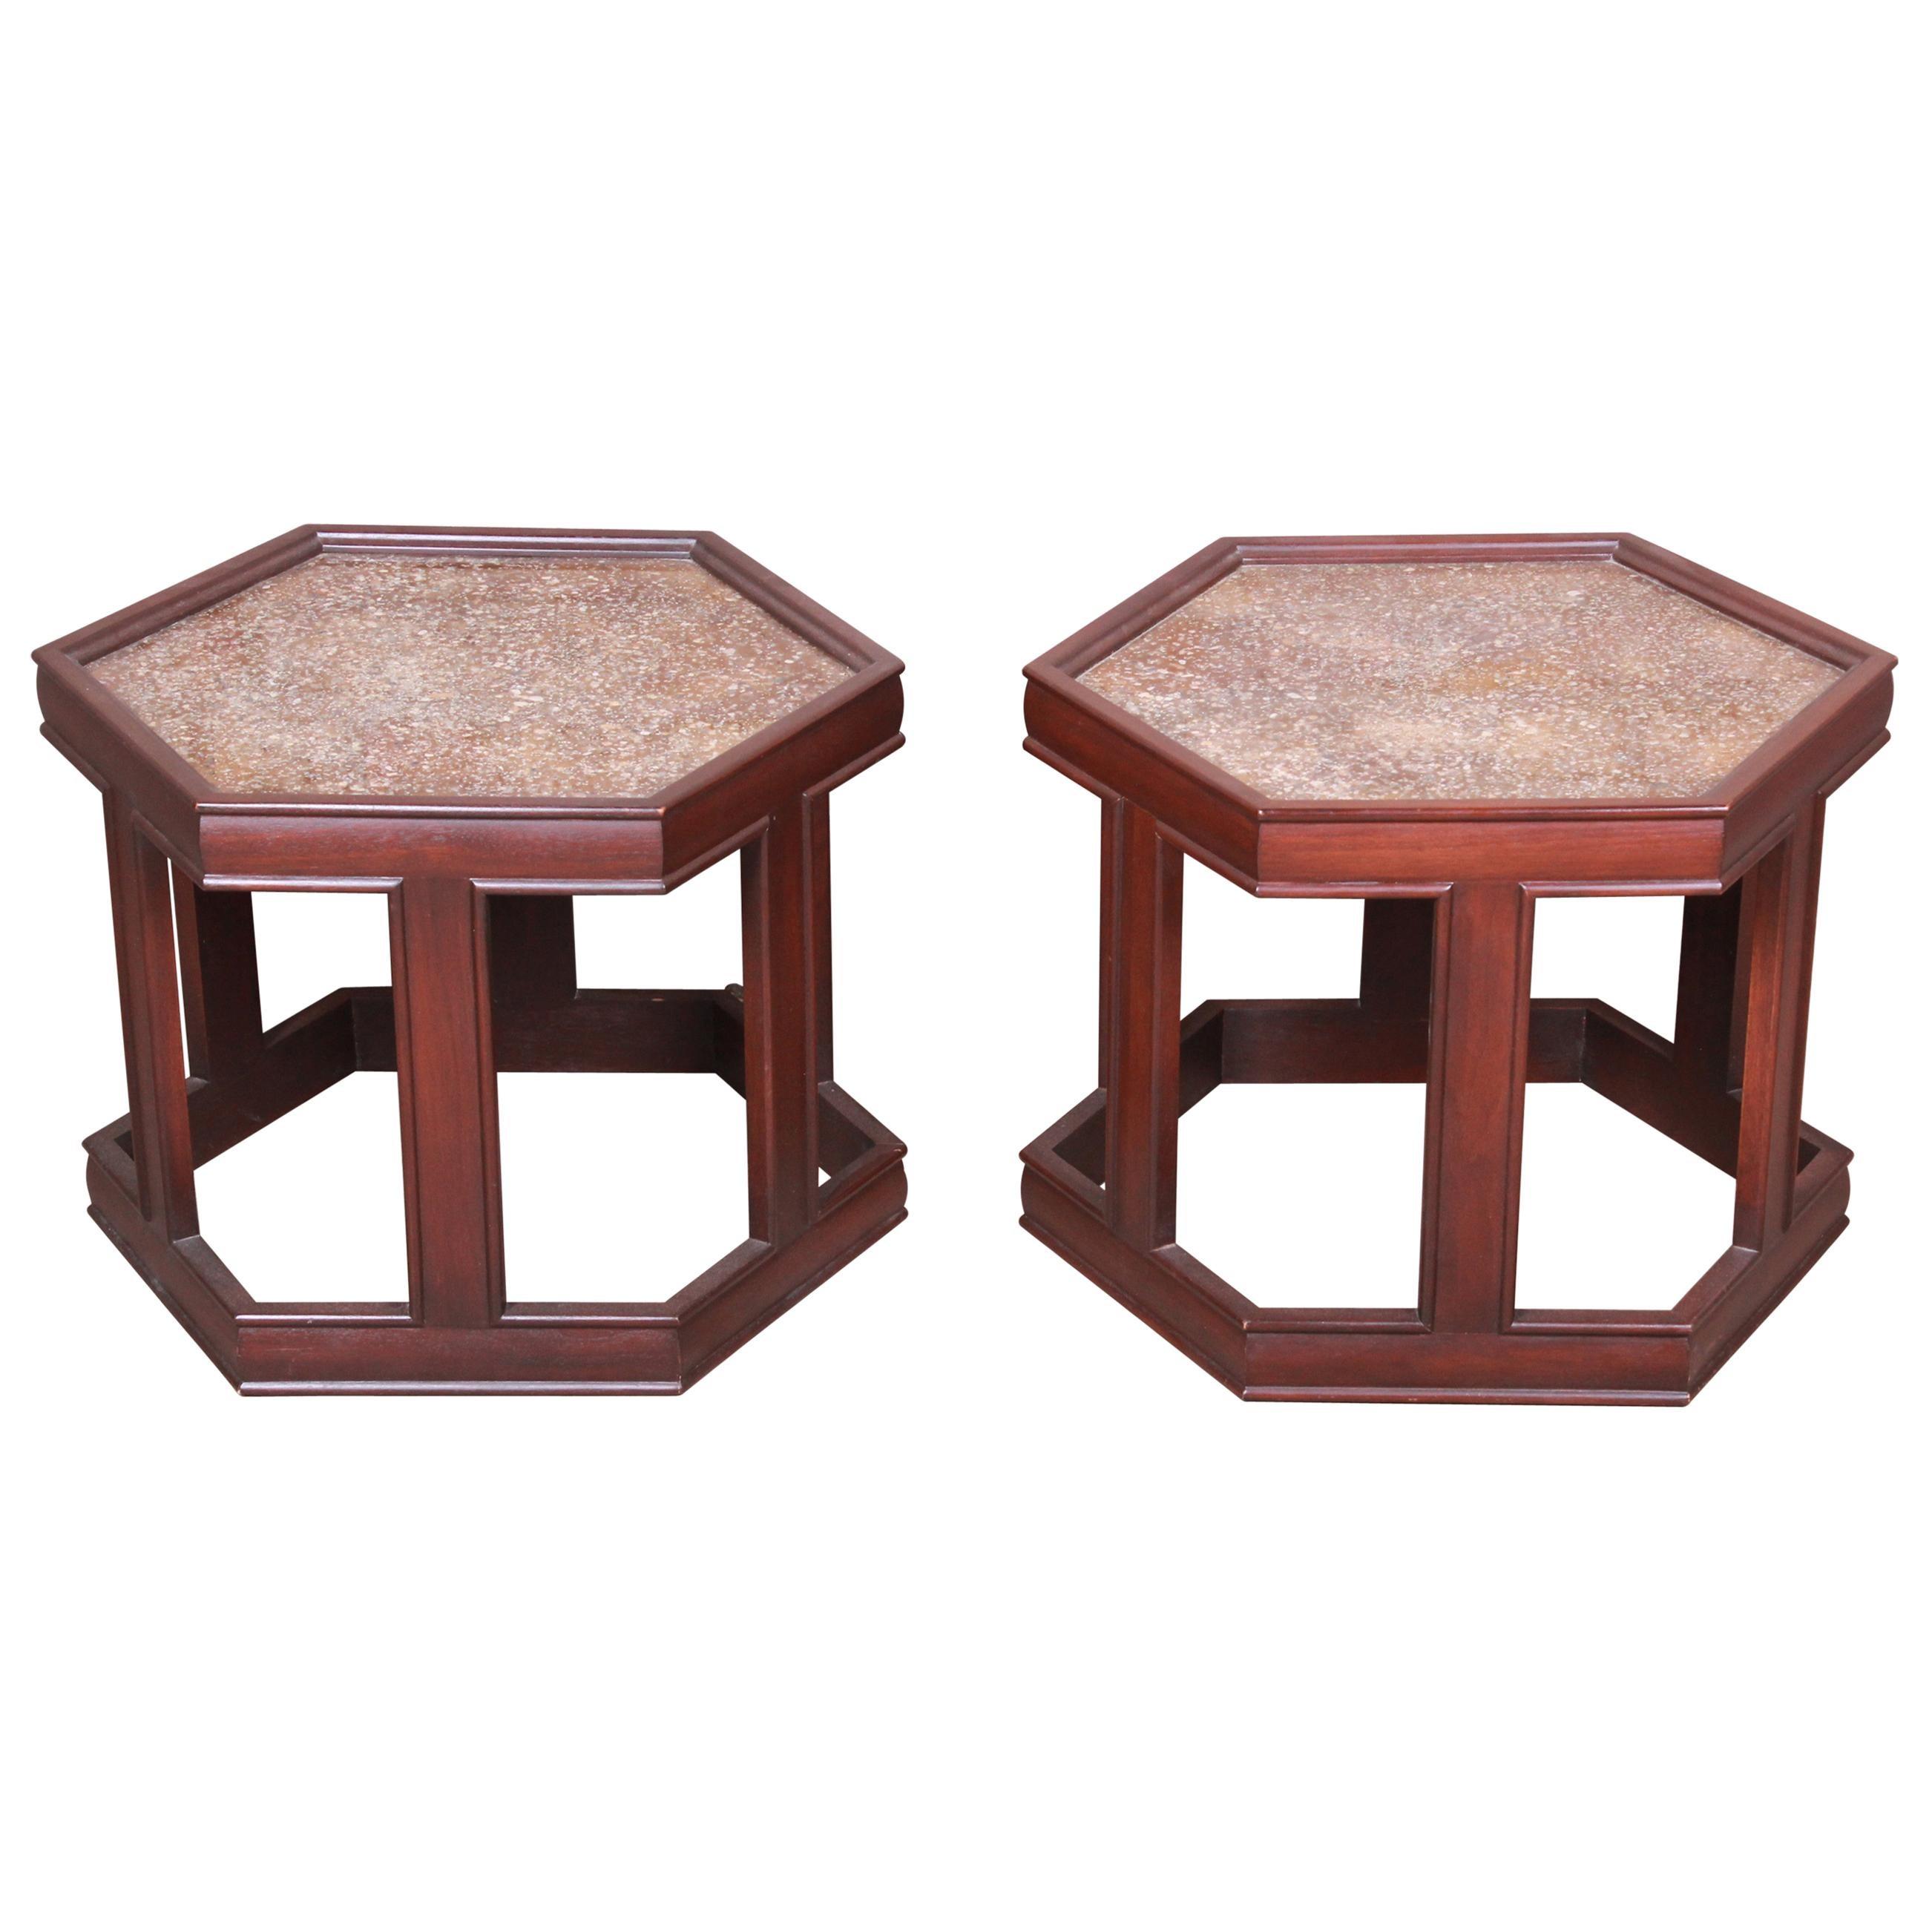 John Keal for Brown Saltman Walnut Hexagonal Side Tables, Pair